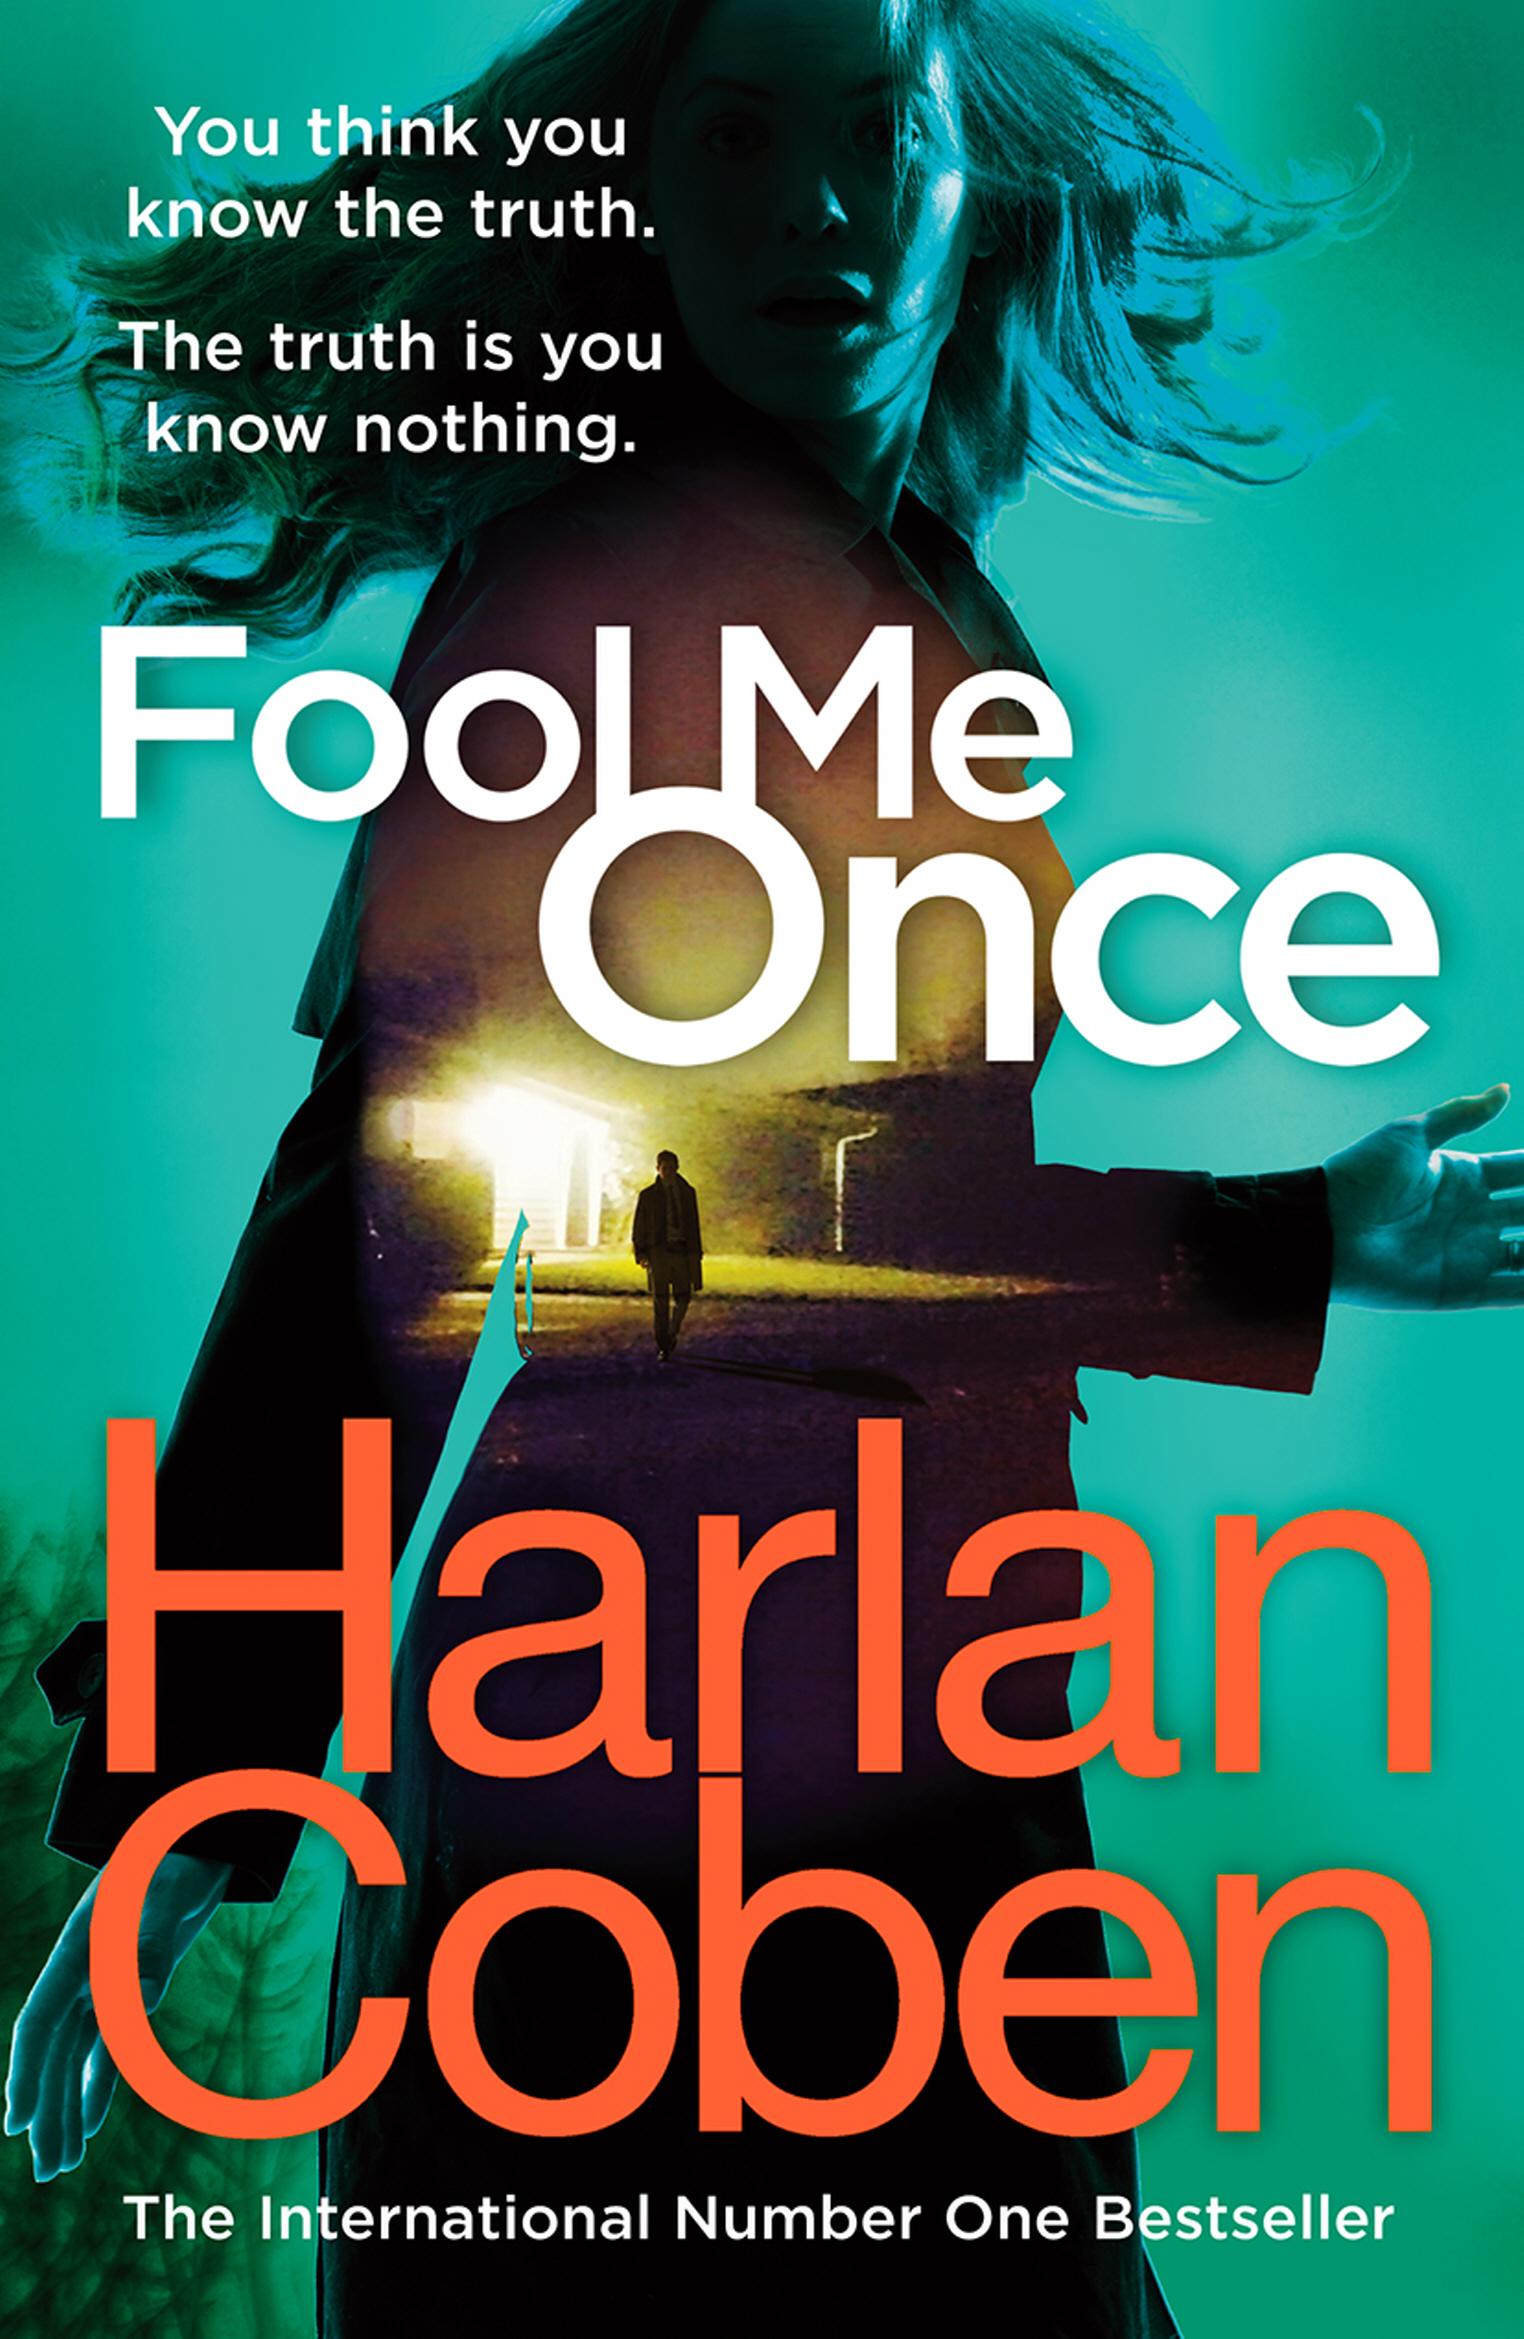 Fool Me Once - Harlan Coben paperback(1)